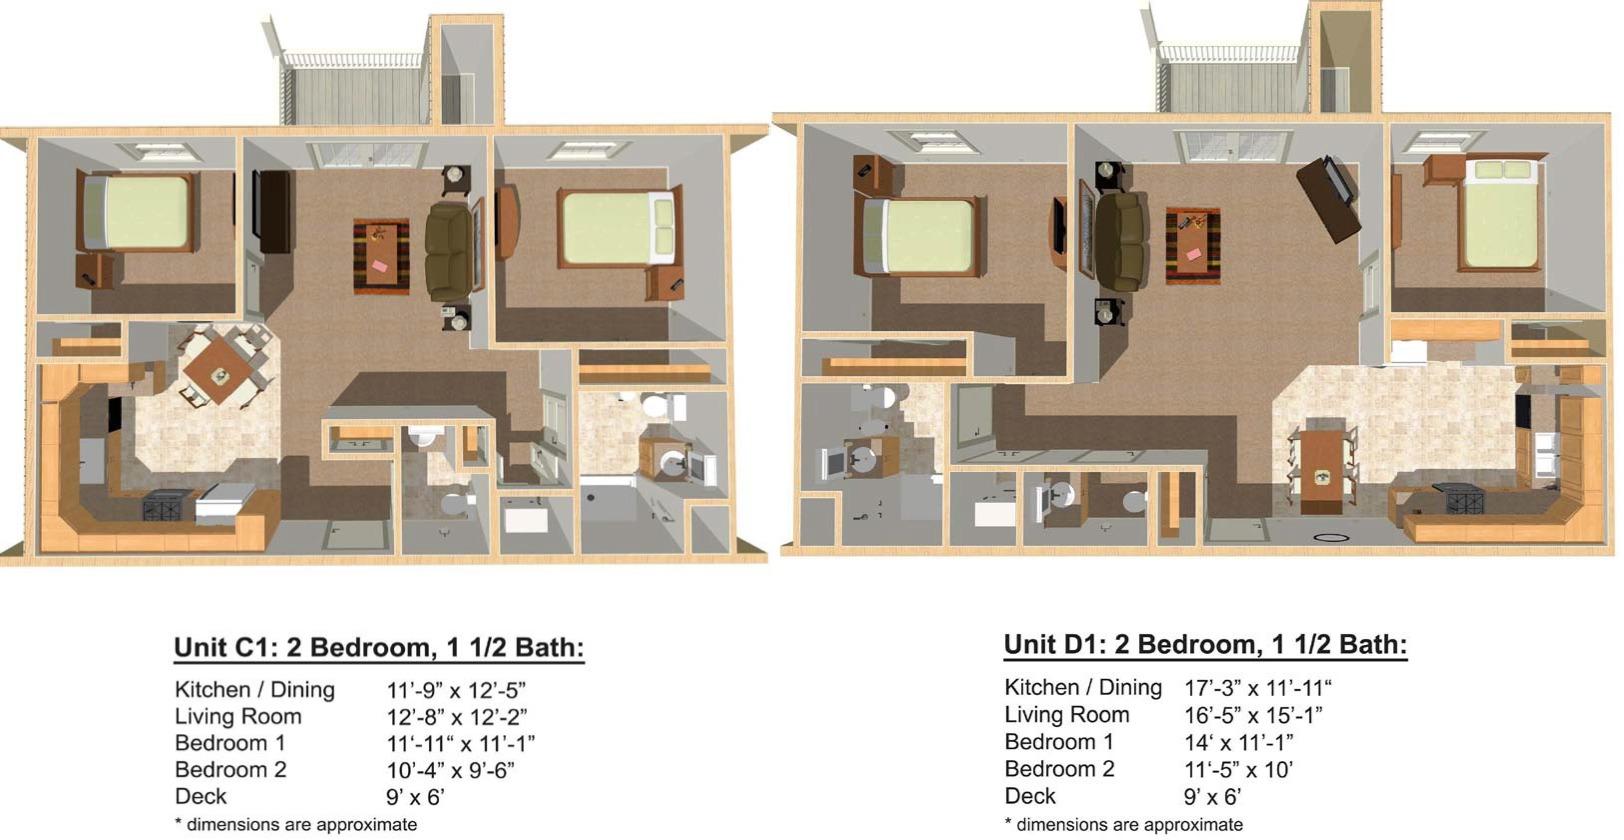 Cobblestone Pointe Senior Village 2 bedroom  with 1 5 bathroom apartment    includes. Calamar   Builder  Developer  Manager and Financer